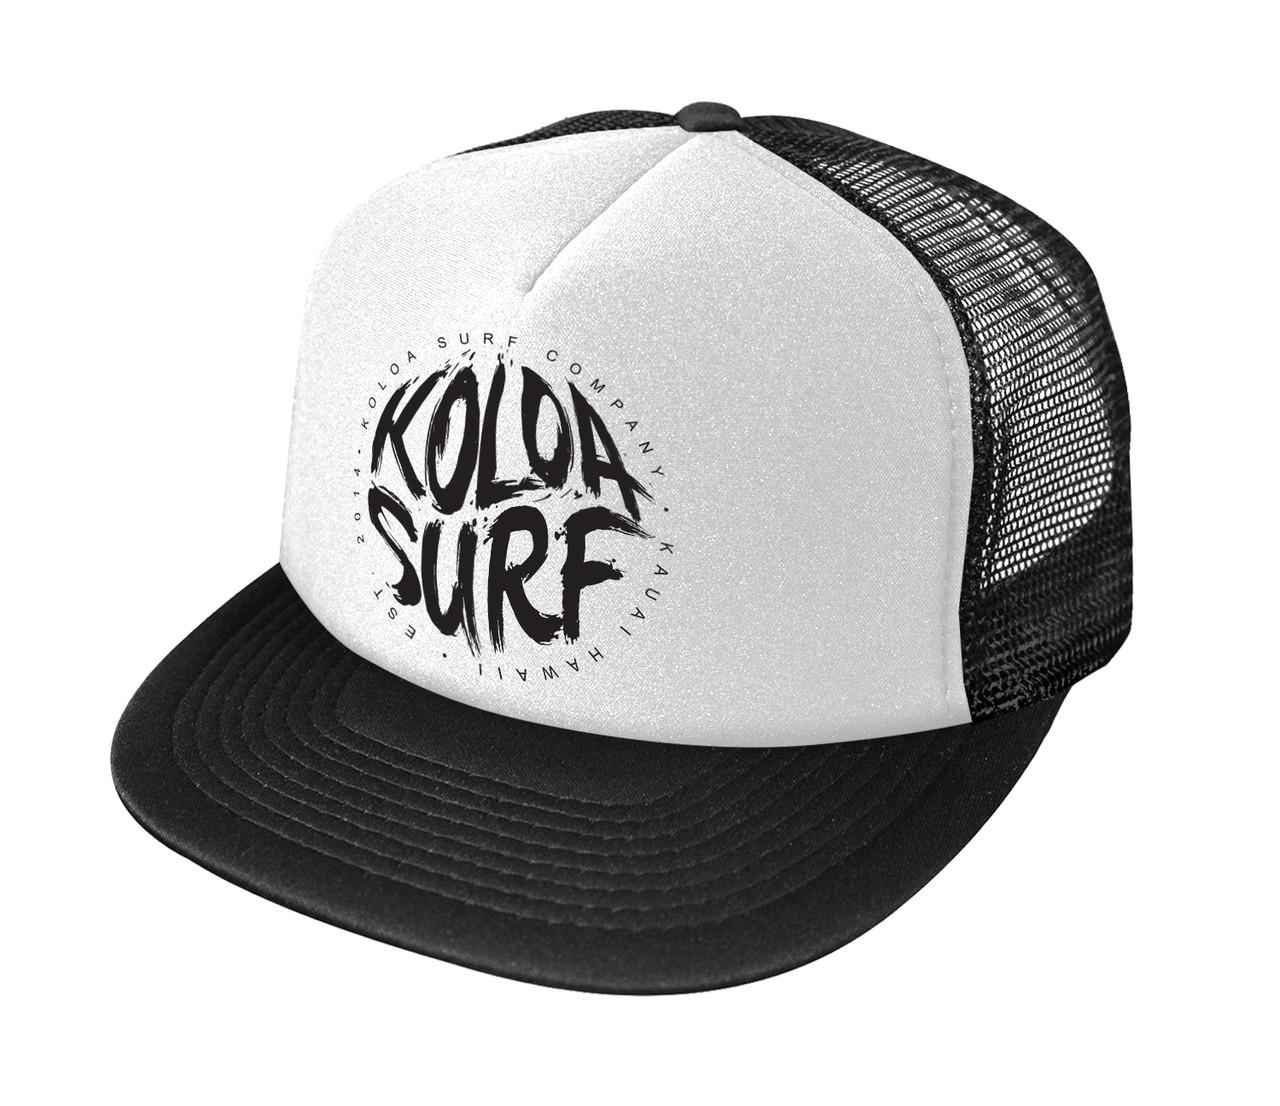 Koloa Surf Brush logo Poly-Foam Mesh Snapback High Profile Trucker ... 74ade141f77c